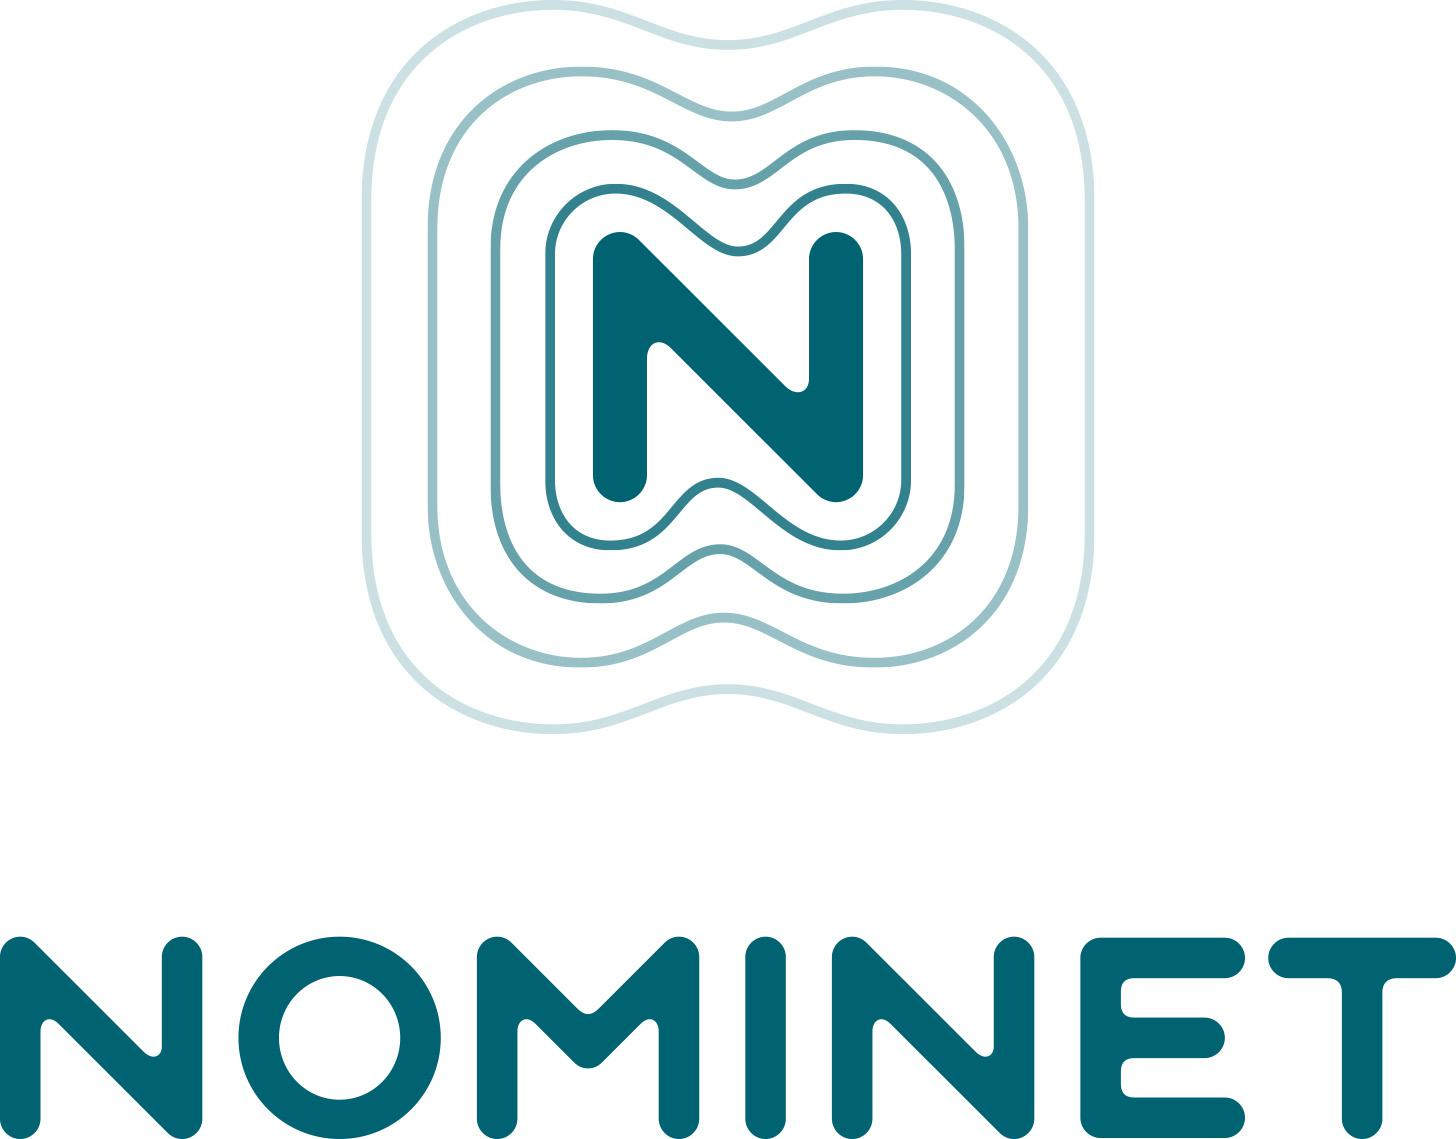 Nominet .co.uk registry